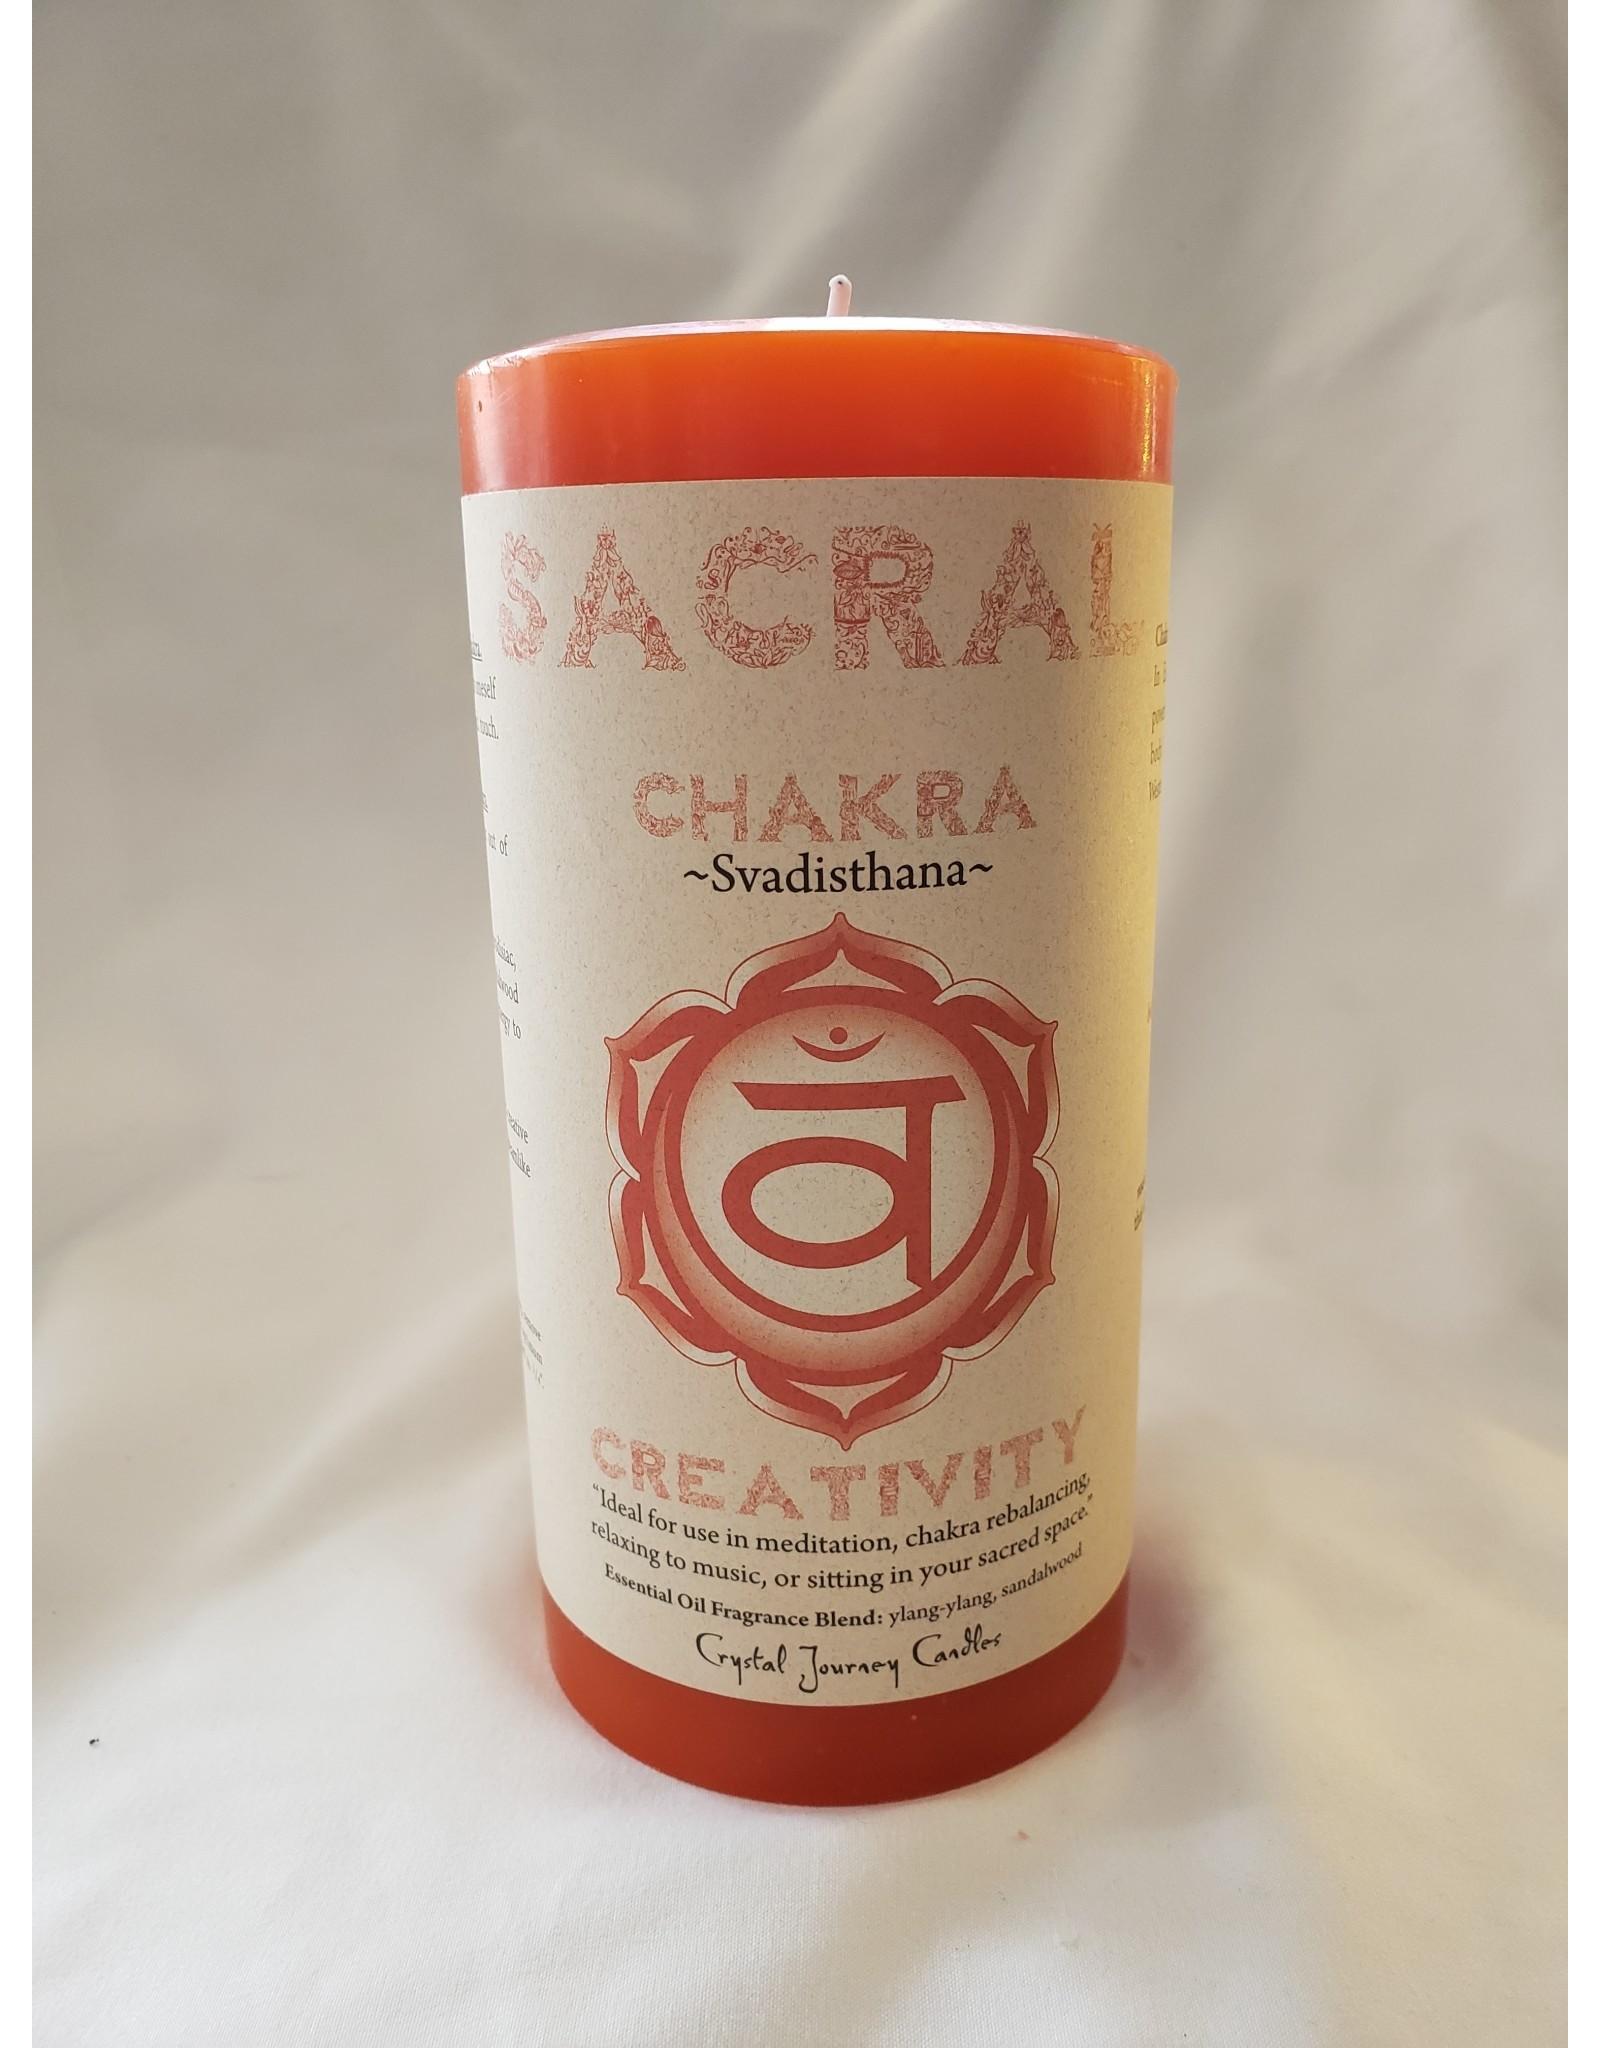 Svadisthana - Sacral Chakra Pillar Candle